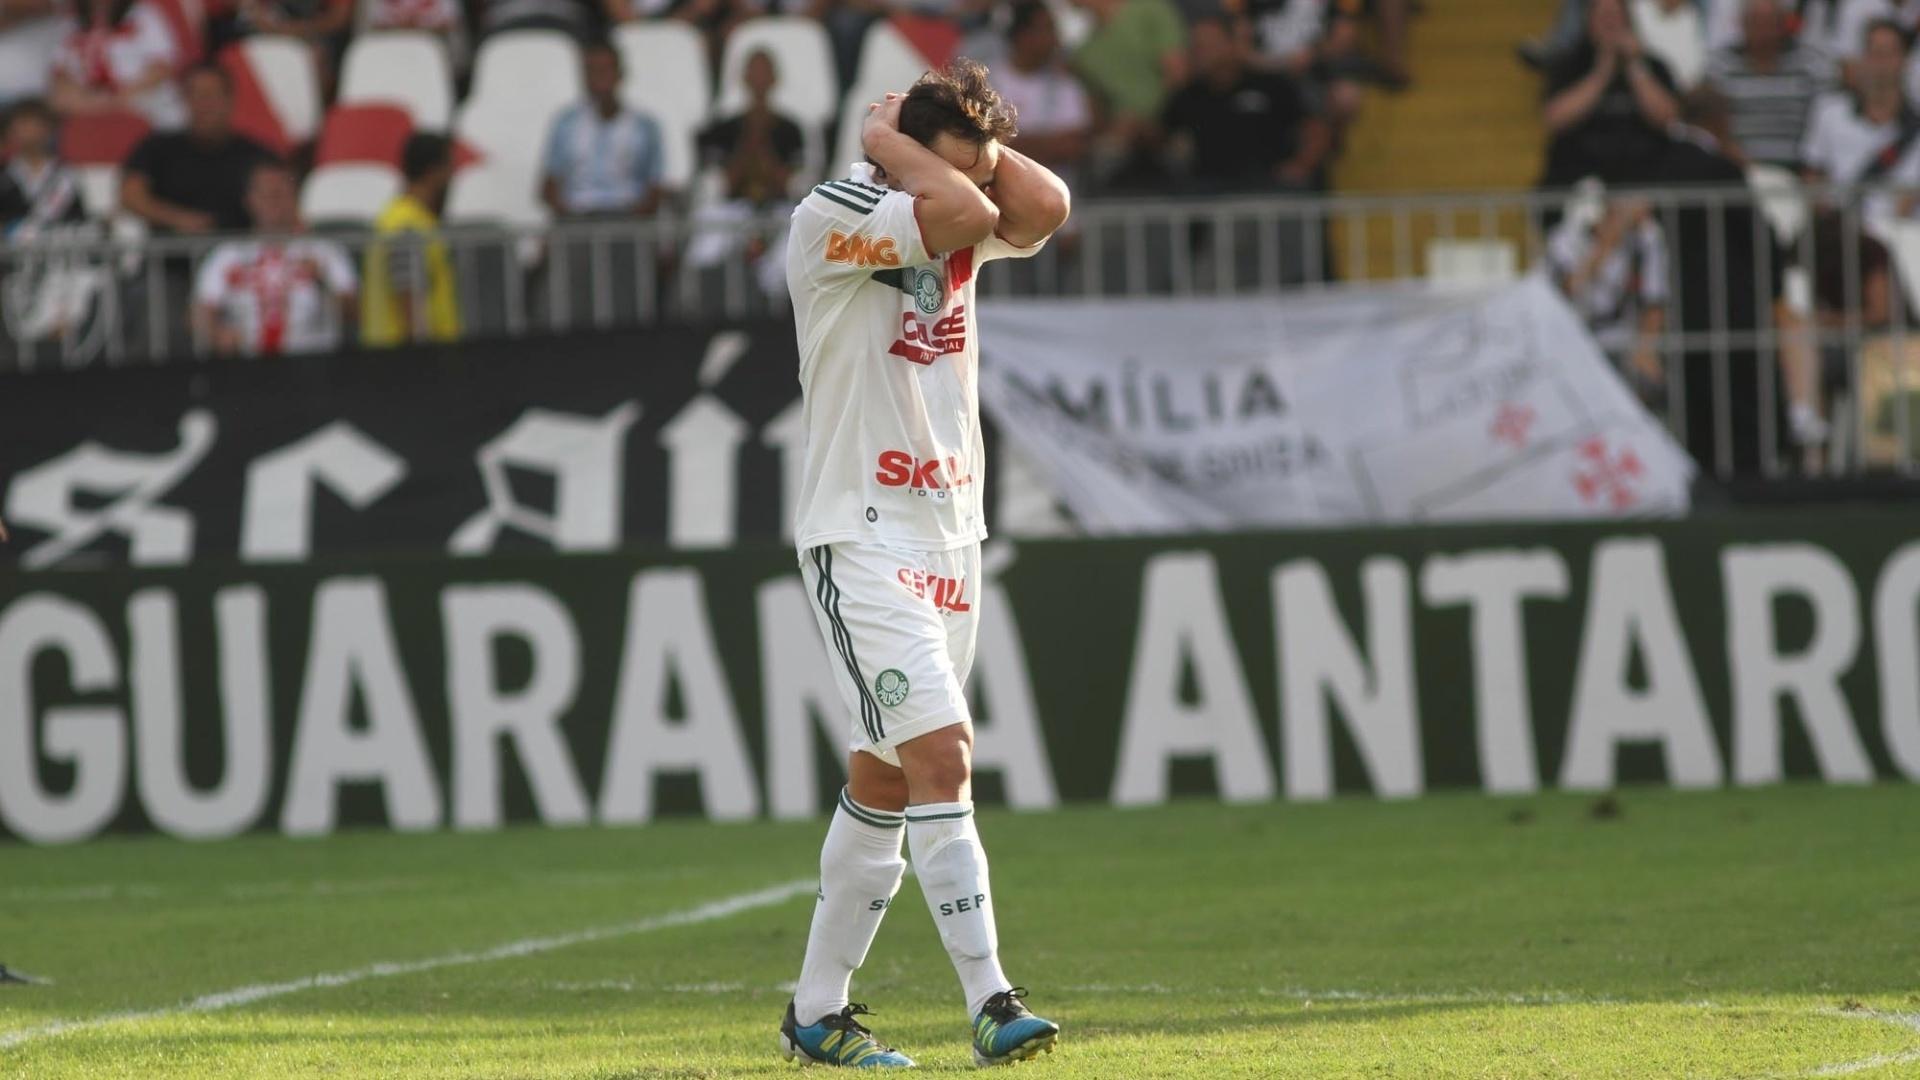 Kleber lamenta jogada perdida dentro da área do Vasco, na derrota por 1 a 0